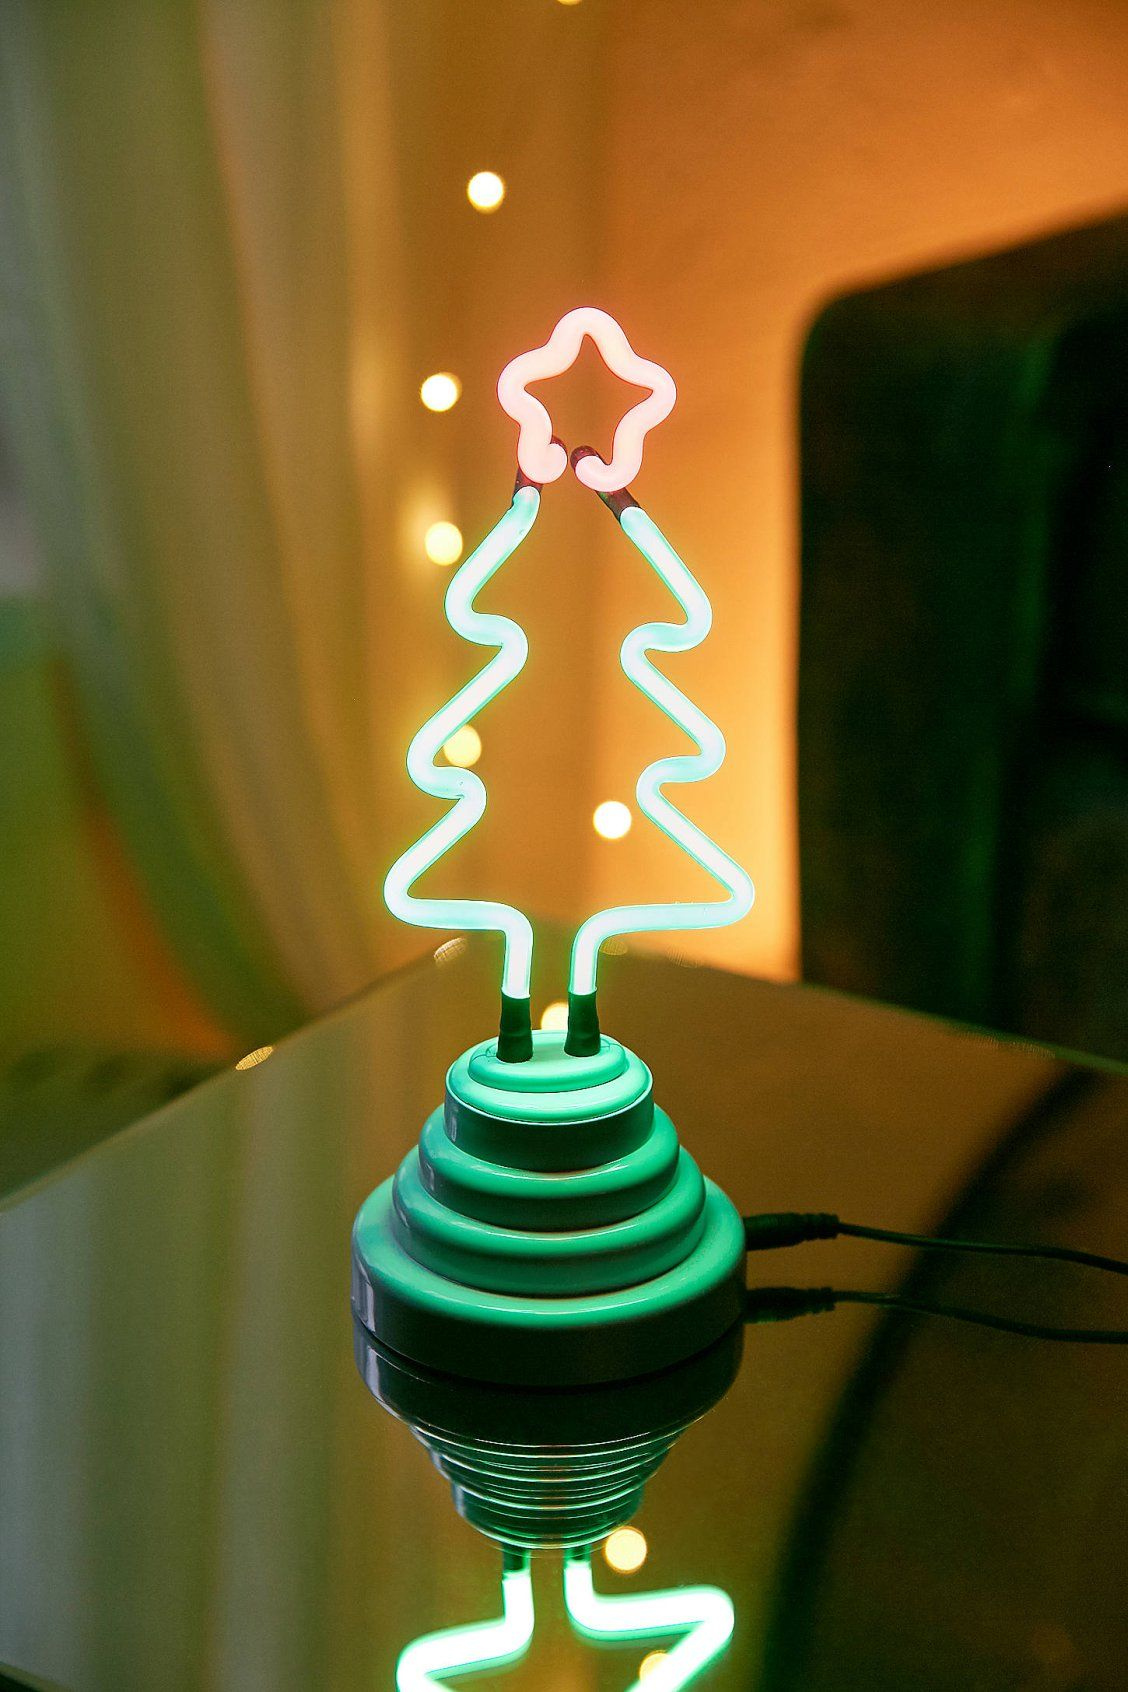 Christmas Tree Neon Sign Table Lamp Lamp Table Lamp Christmas Tree